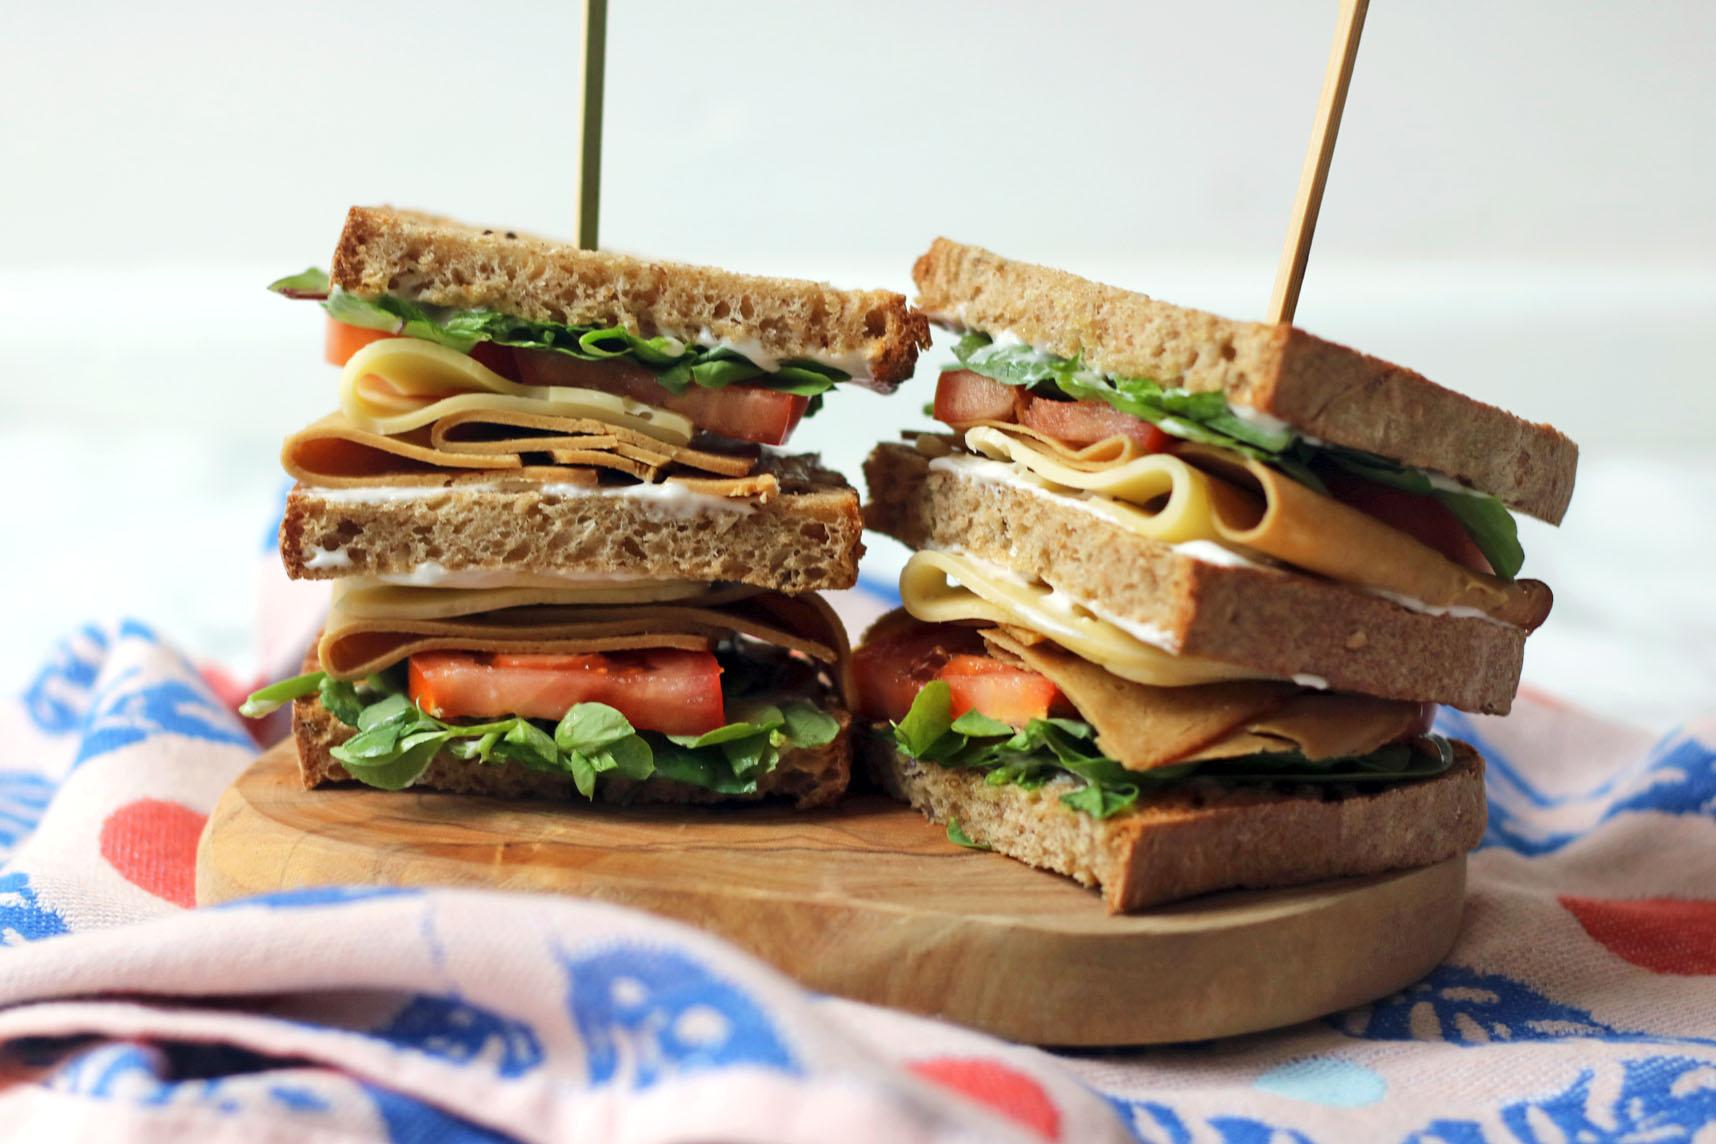 The Ultimate Vegan Club Sandwich